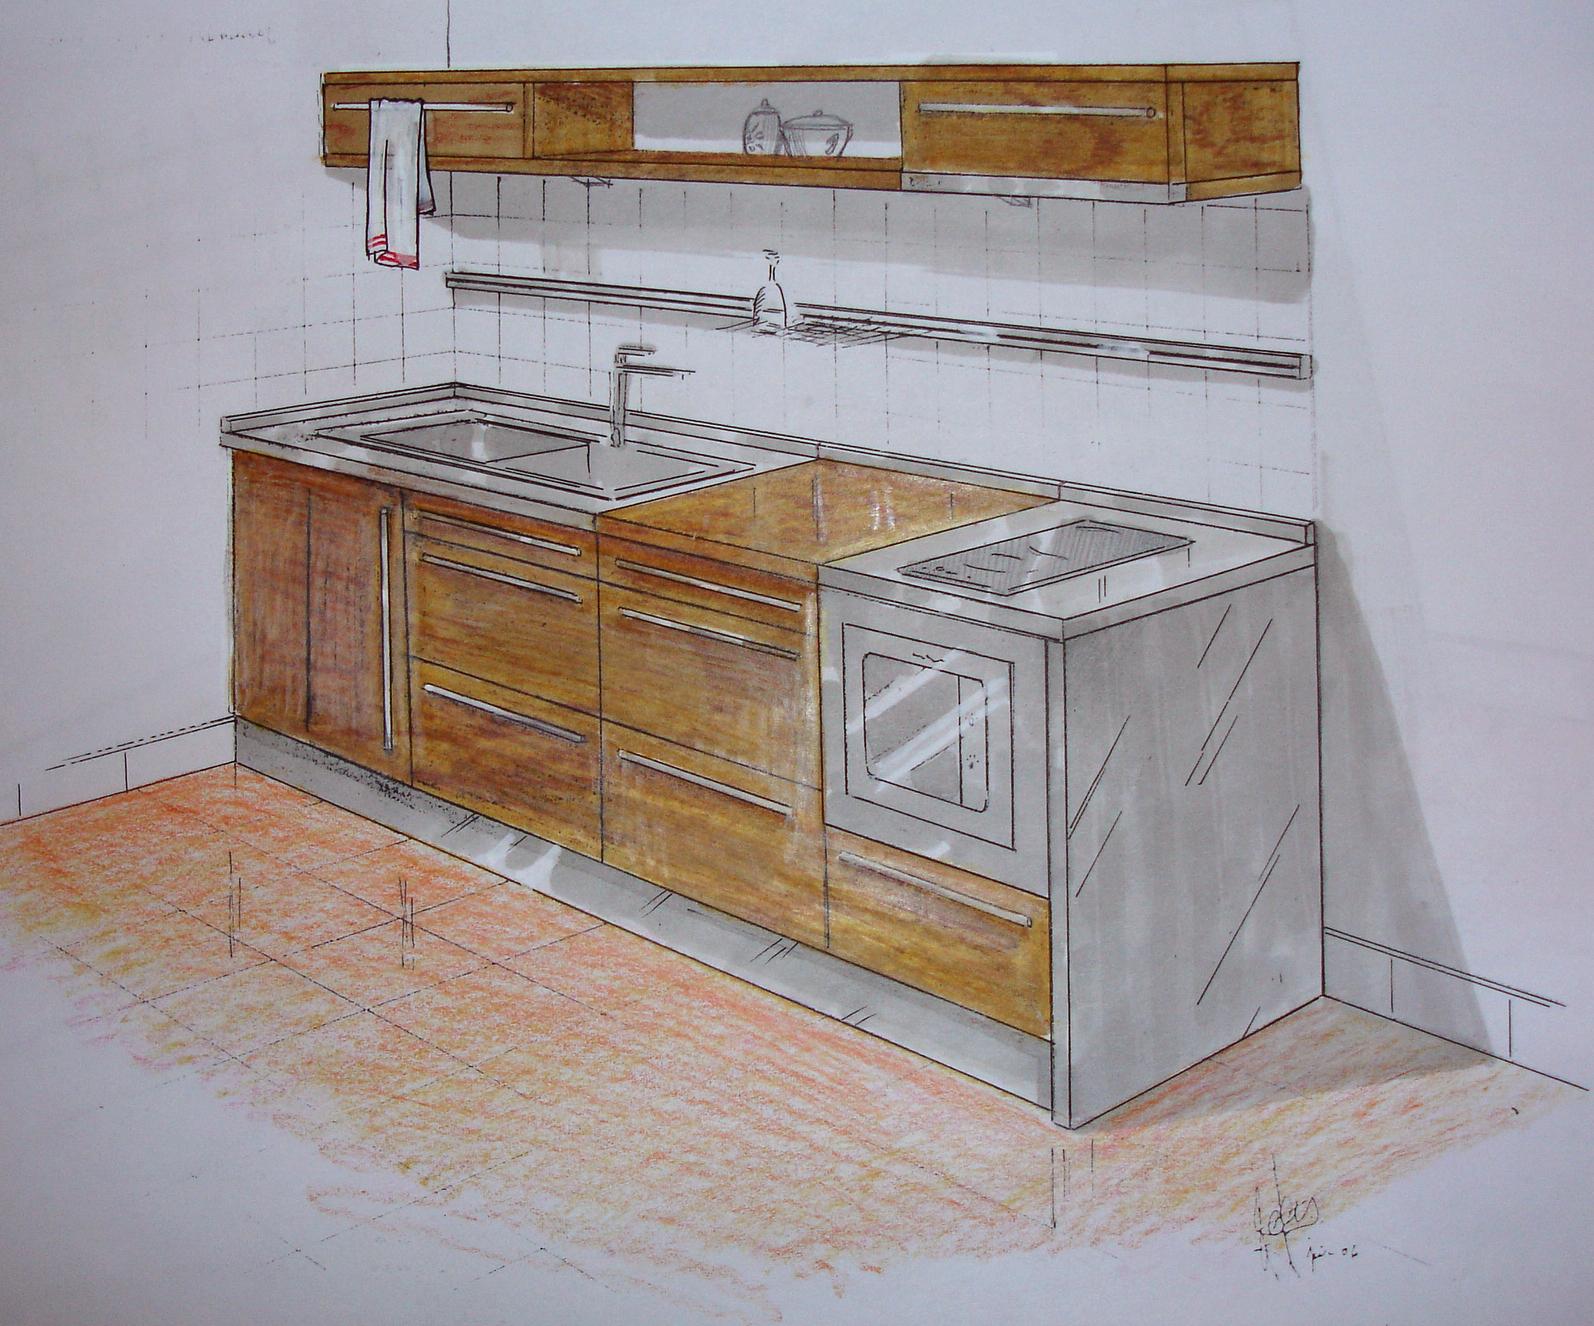 cuisiniste aubagne trendy cuisiniste aubagne jpx concept amnagement dressings placards et. Black Bedroom Furniture Sets. Home Design Ideas